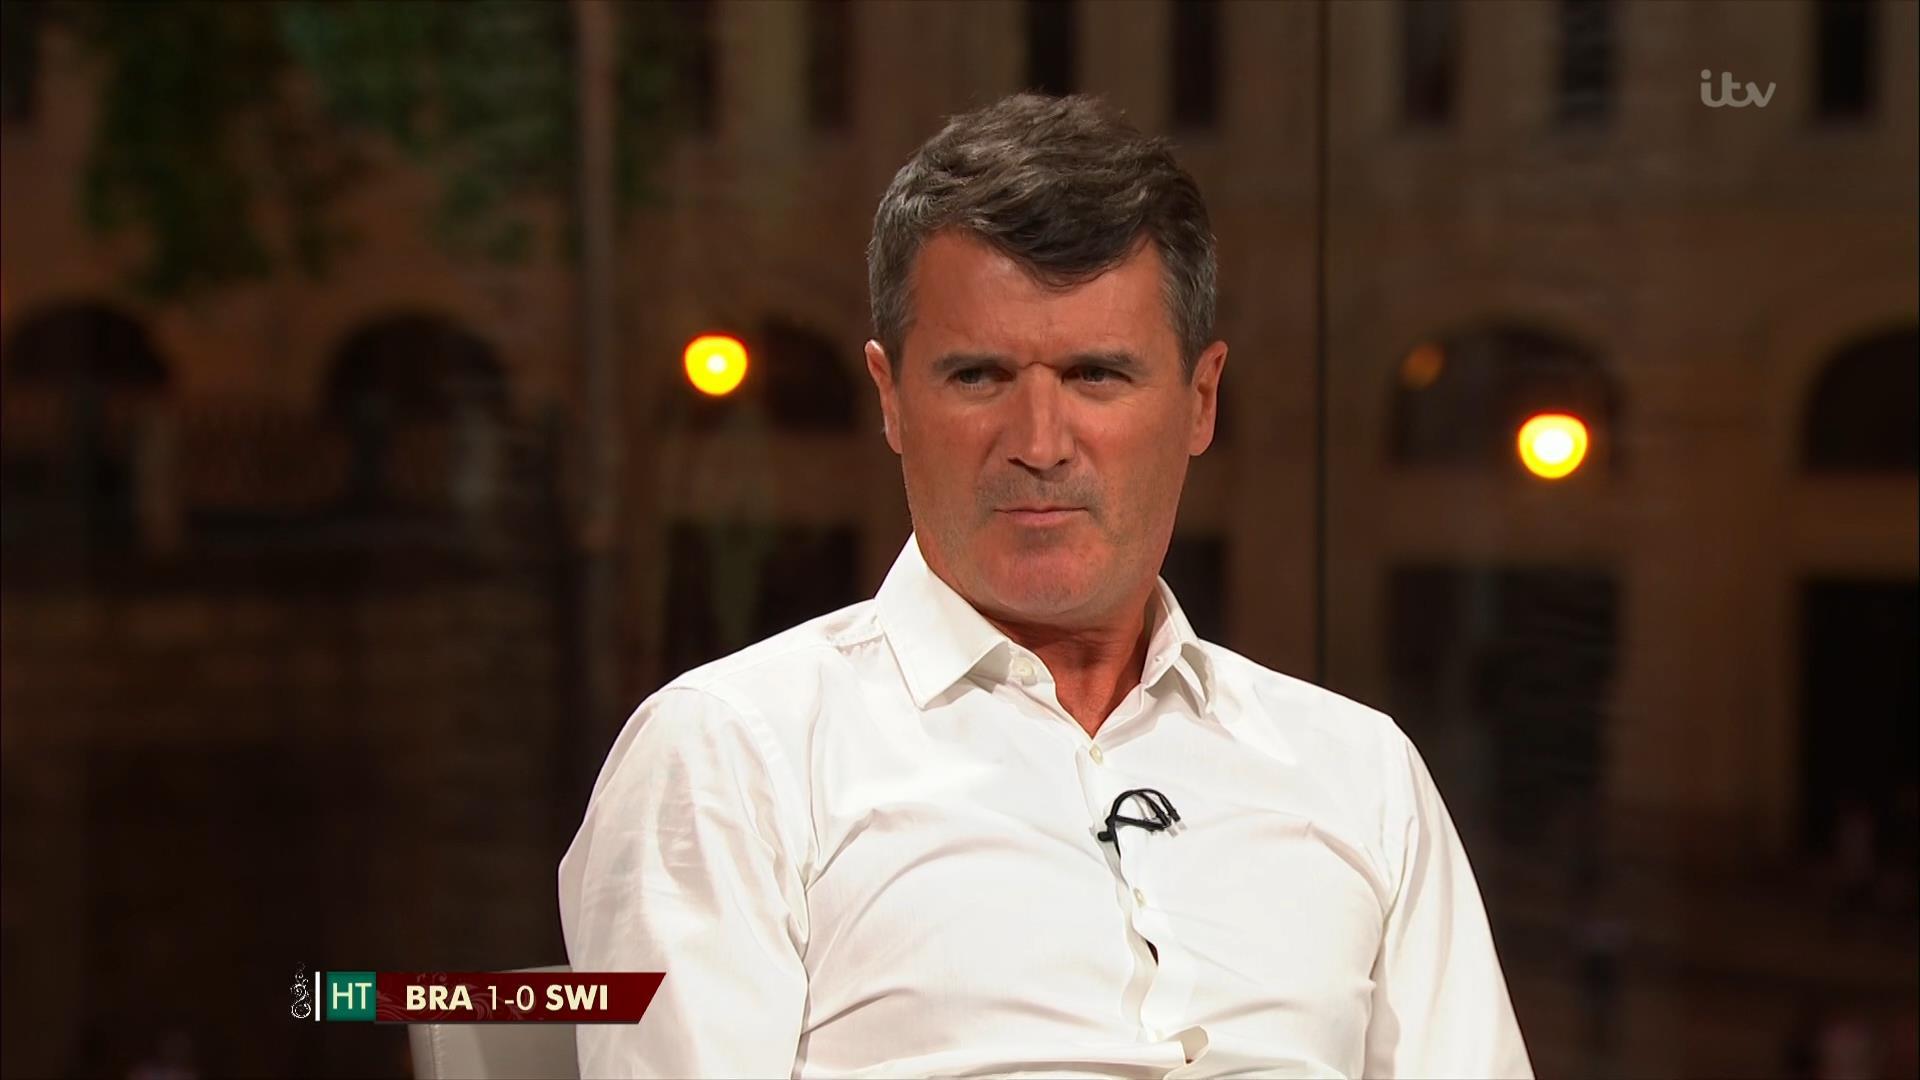 Roy Keane - World Cup 2018 ITV (1)